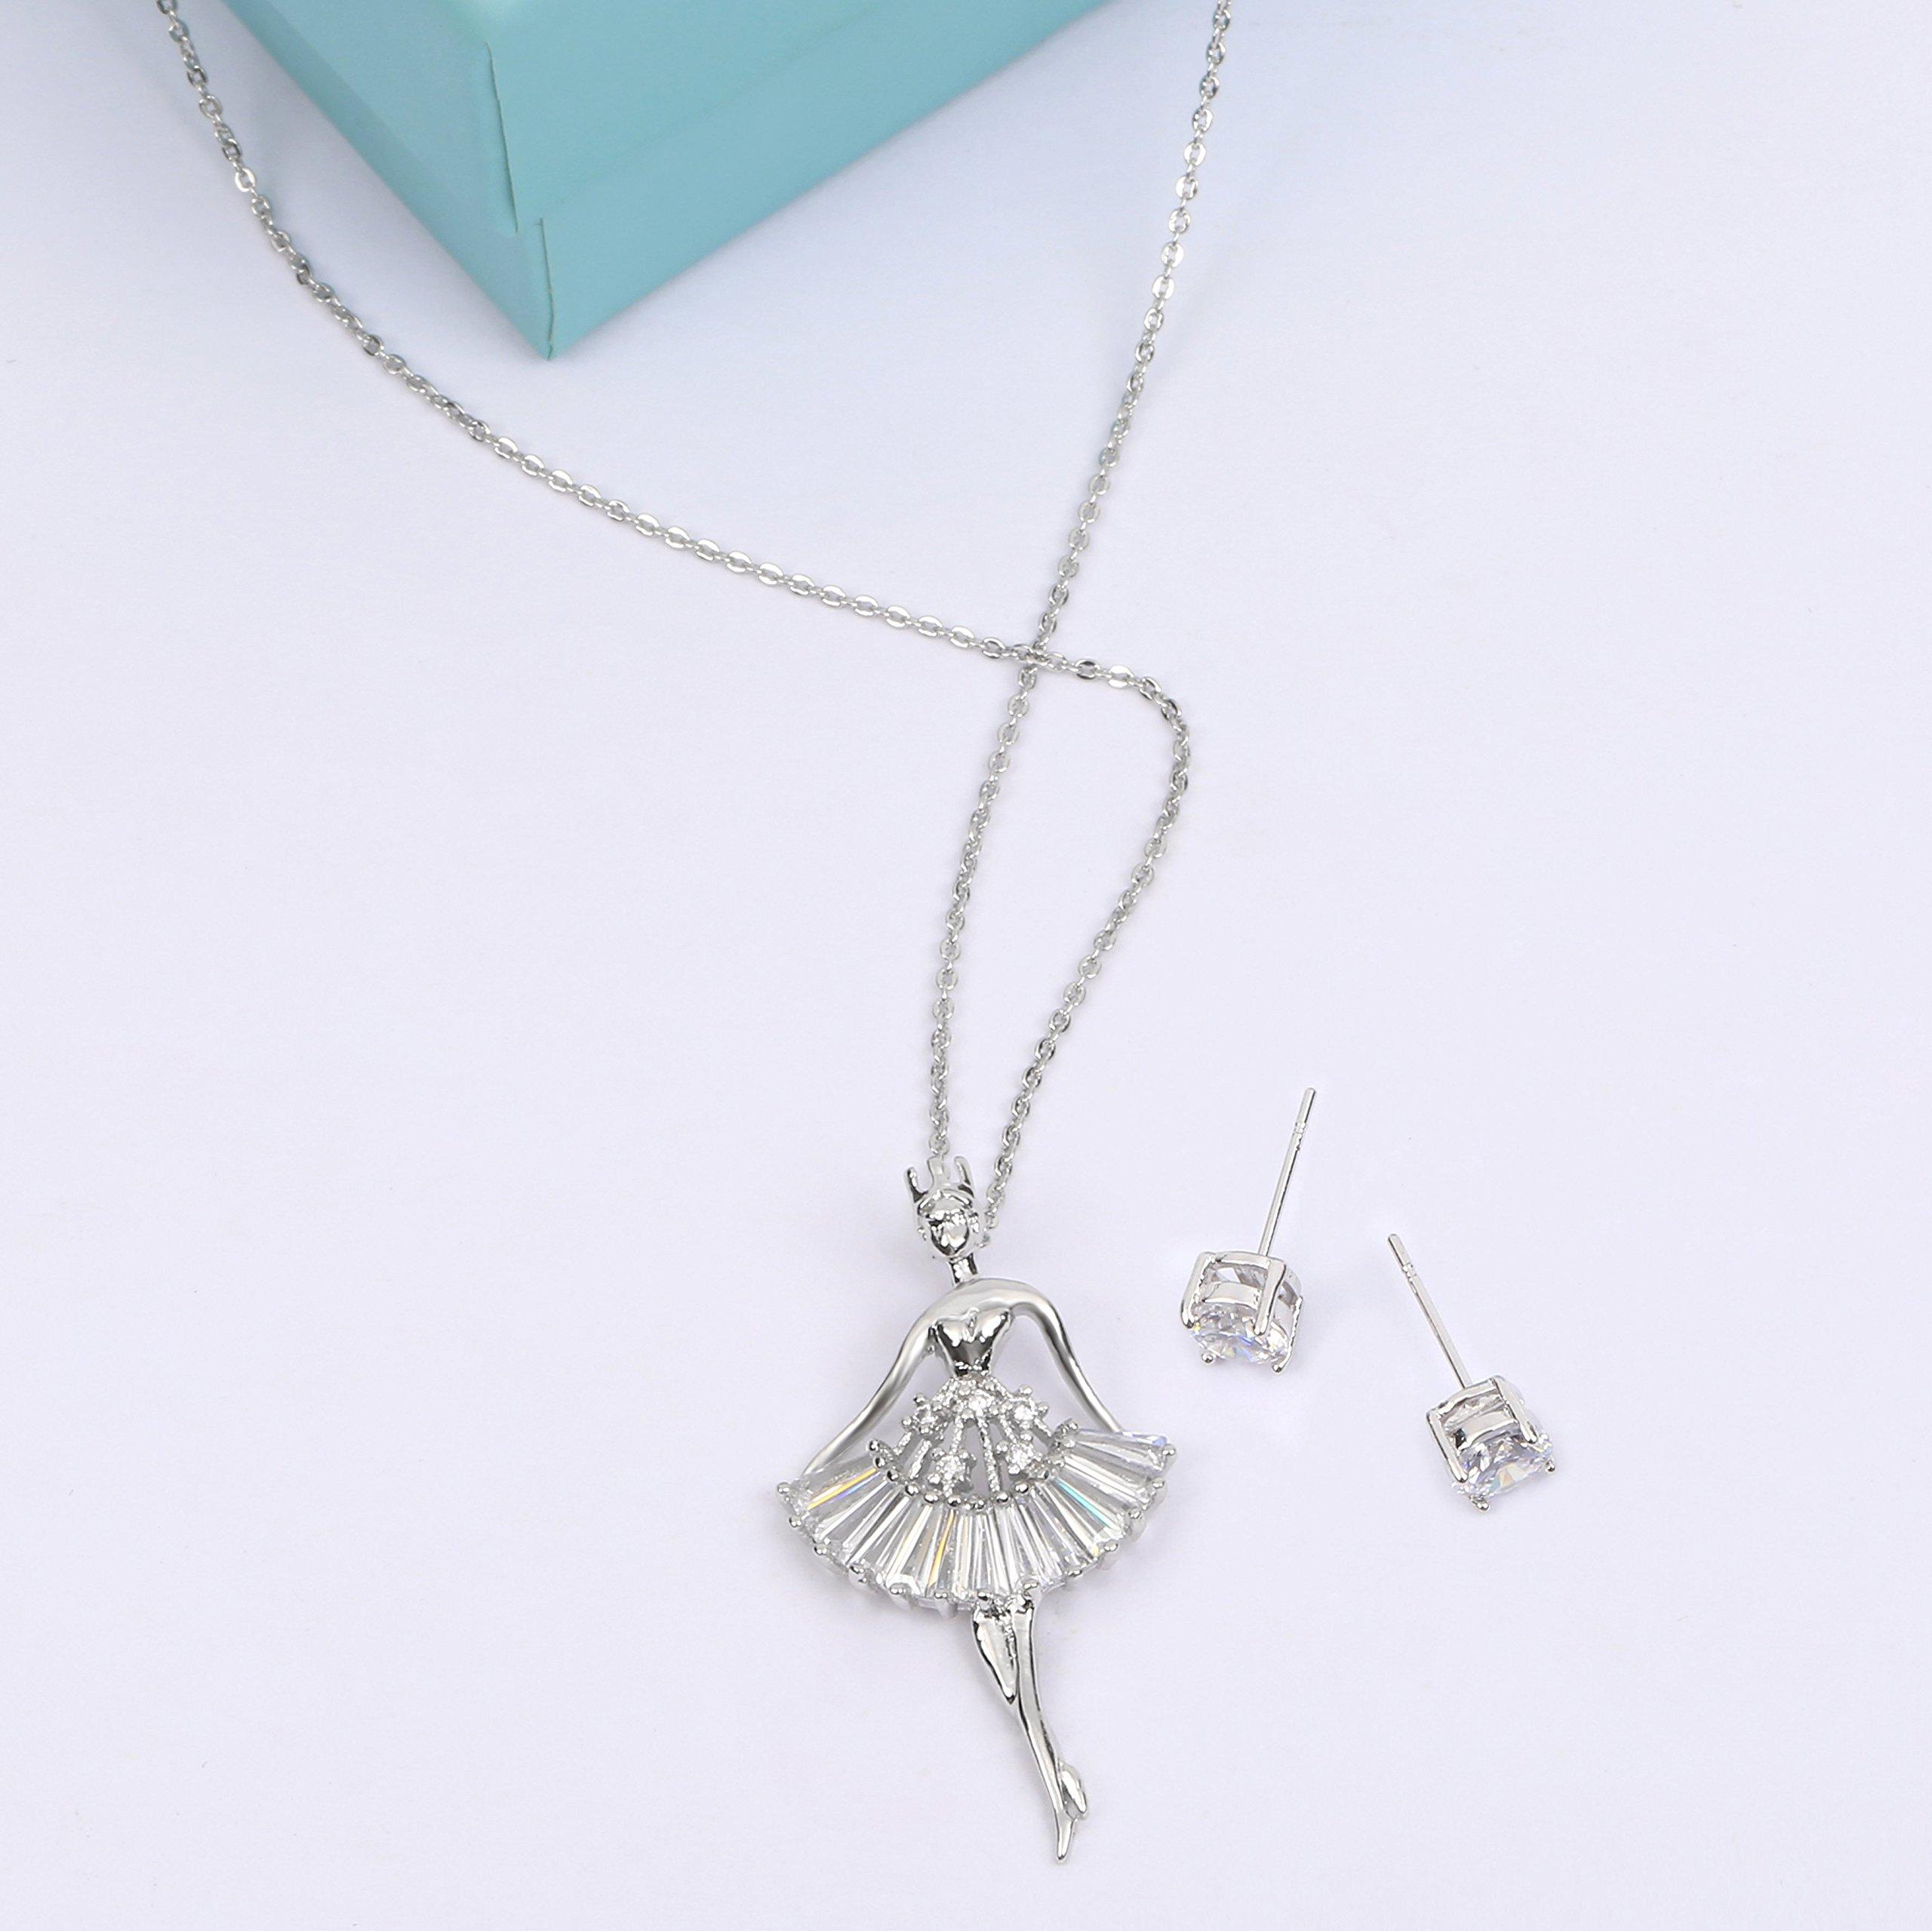 MYKEA Elegant Jewelry Set for Women 18K White Gold Ballerina Girl Pendant Necklace with Cubic Zirconia Stud Earrings for Teen Girls Jewelry by MYKEA (Image #3)